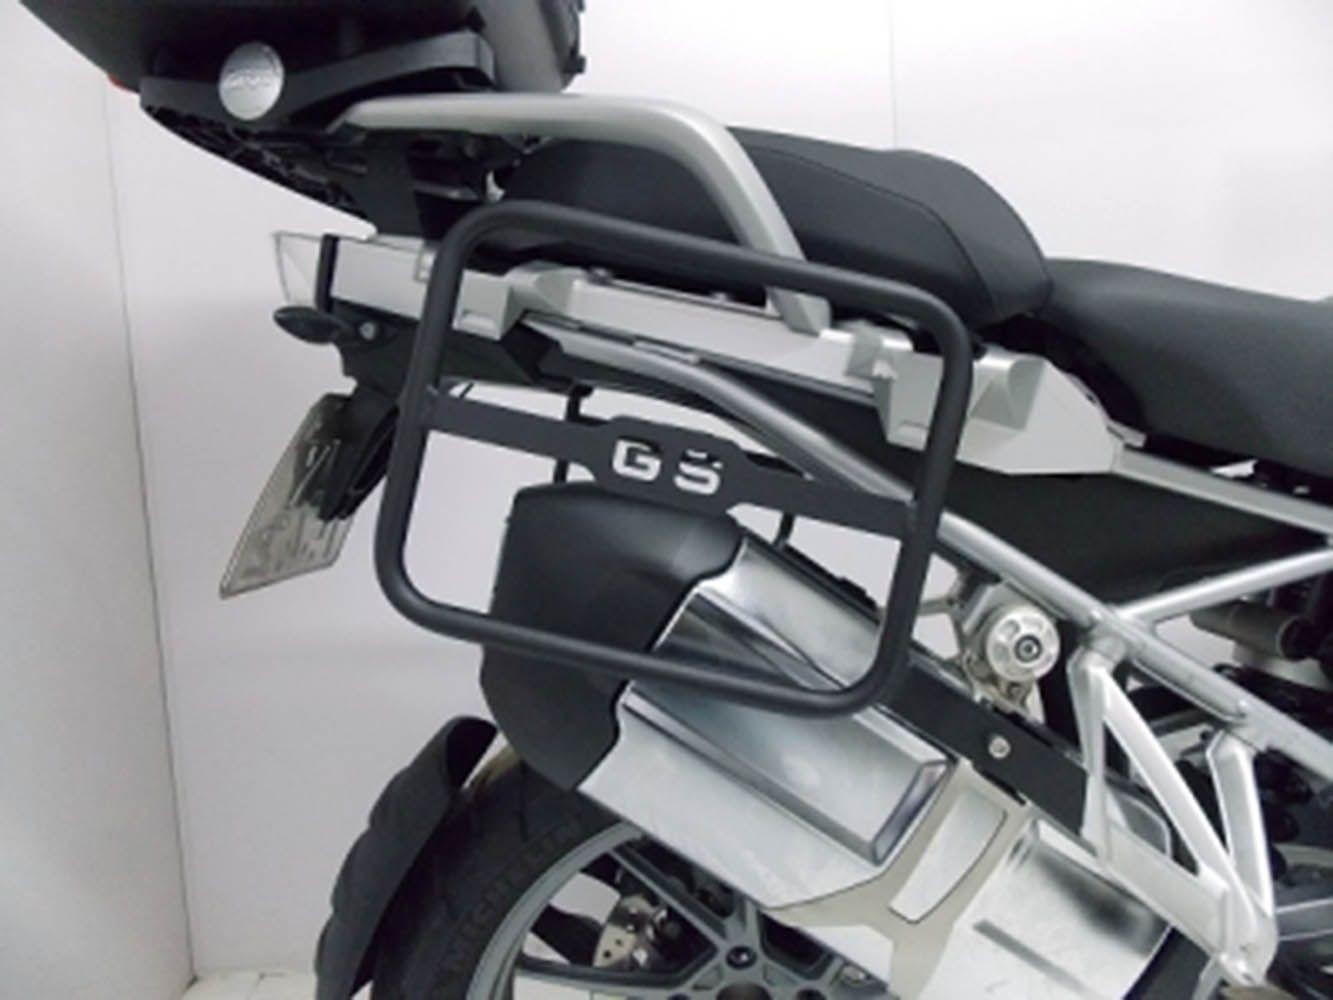 Afastador Alforge R 1200 Gs Sport Bmw 2014 Preto Chapam 893